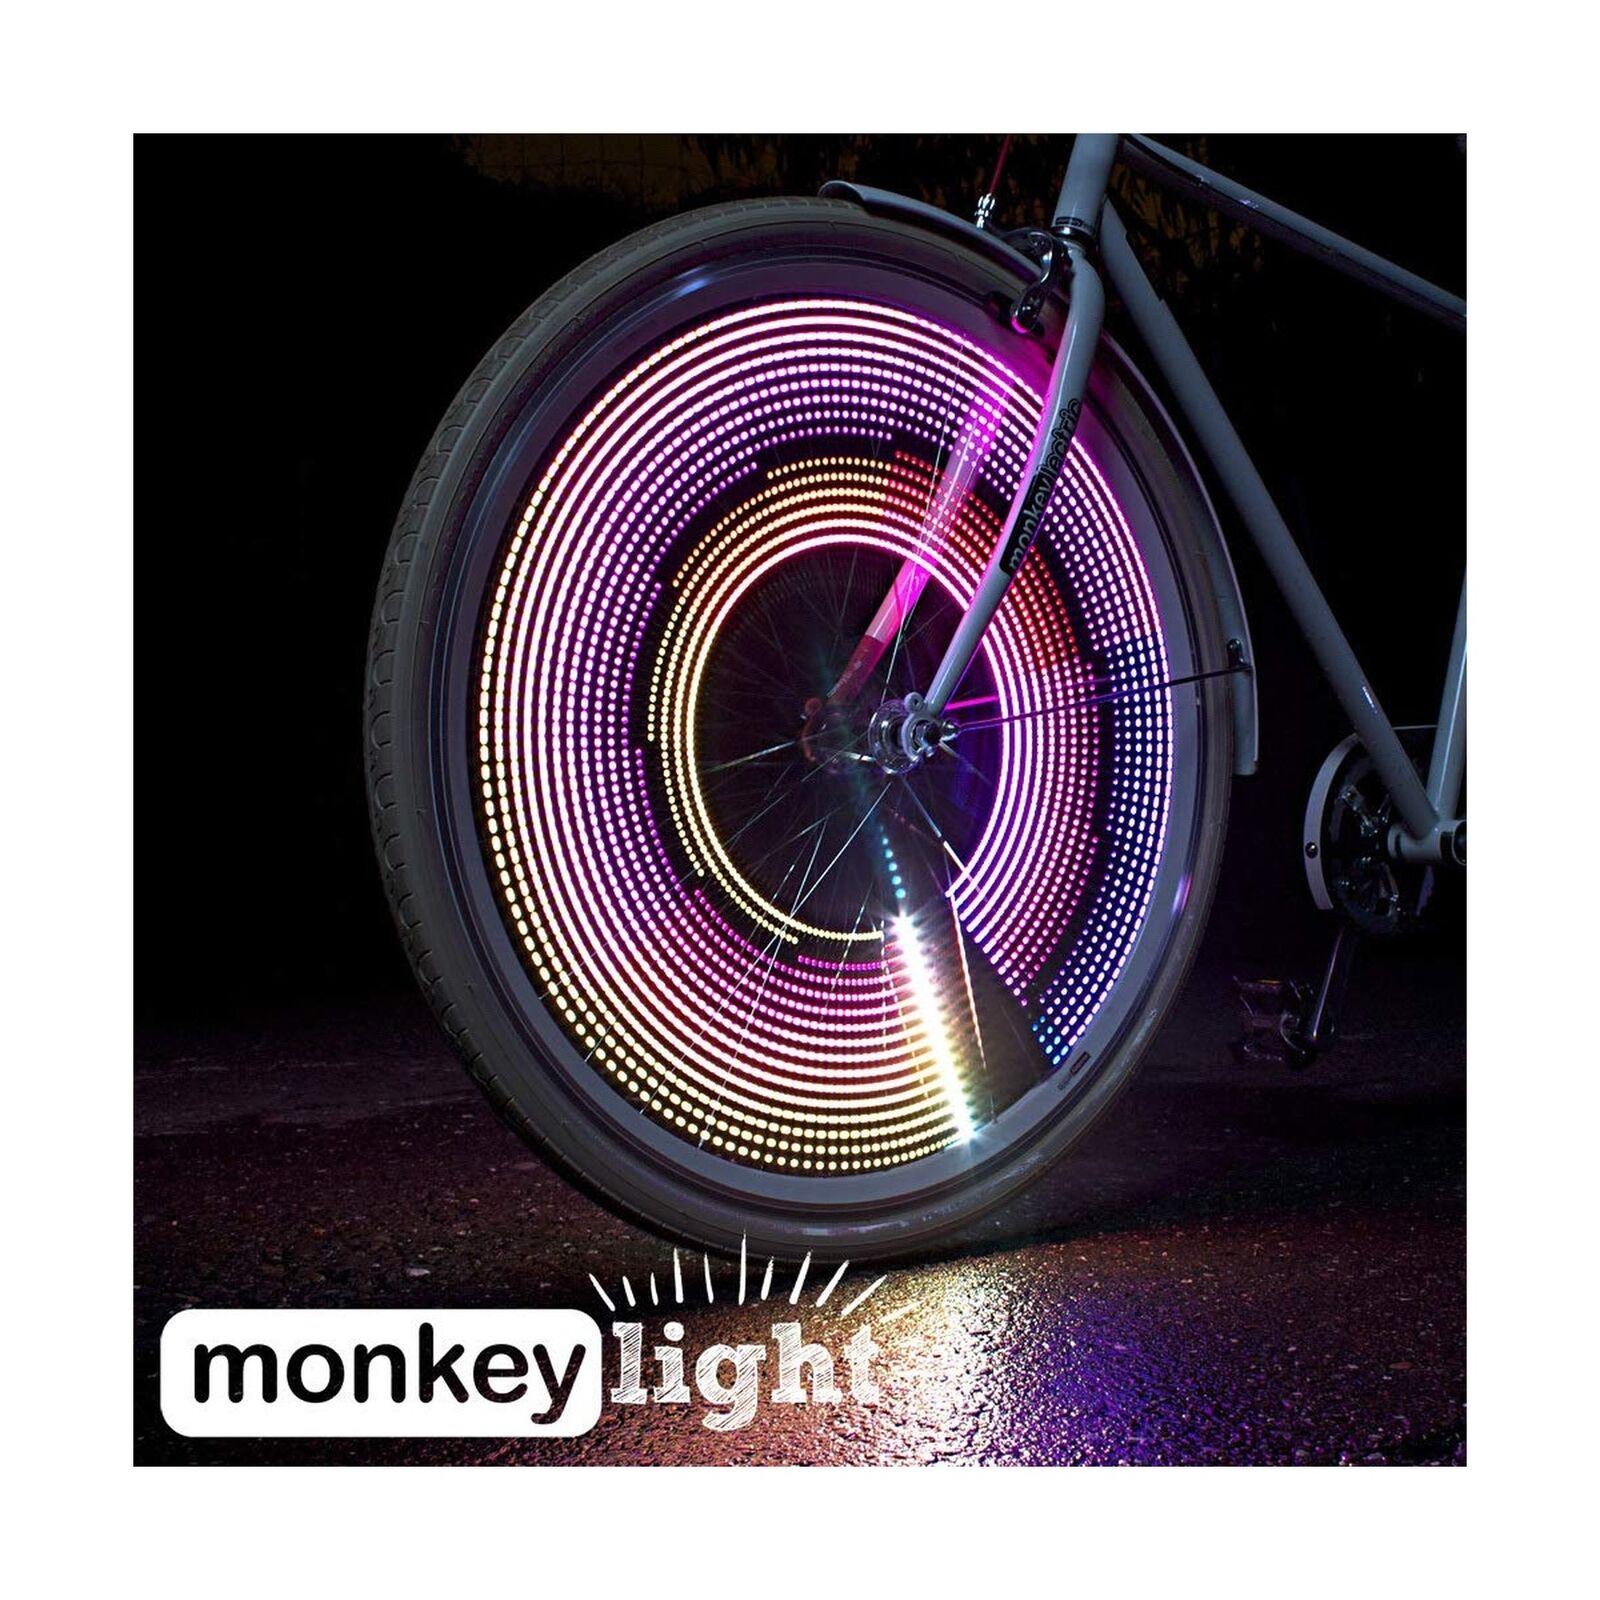 bicicletta rueda Light  200 Luuomini  32 Full Coloree LED  Waterproof